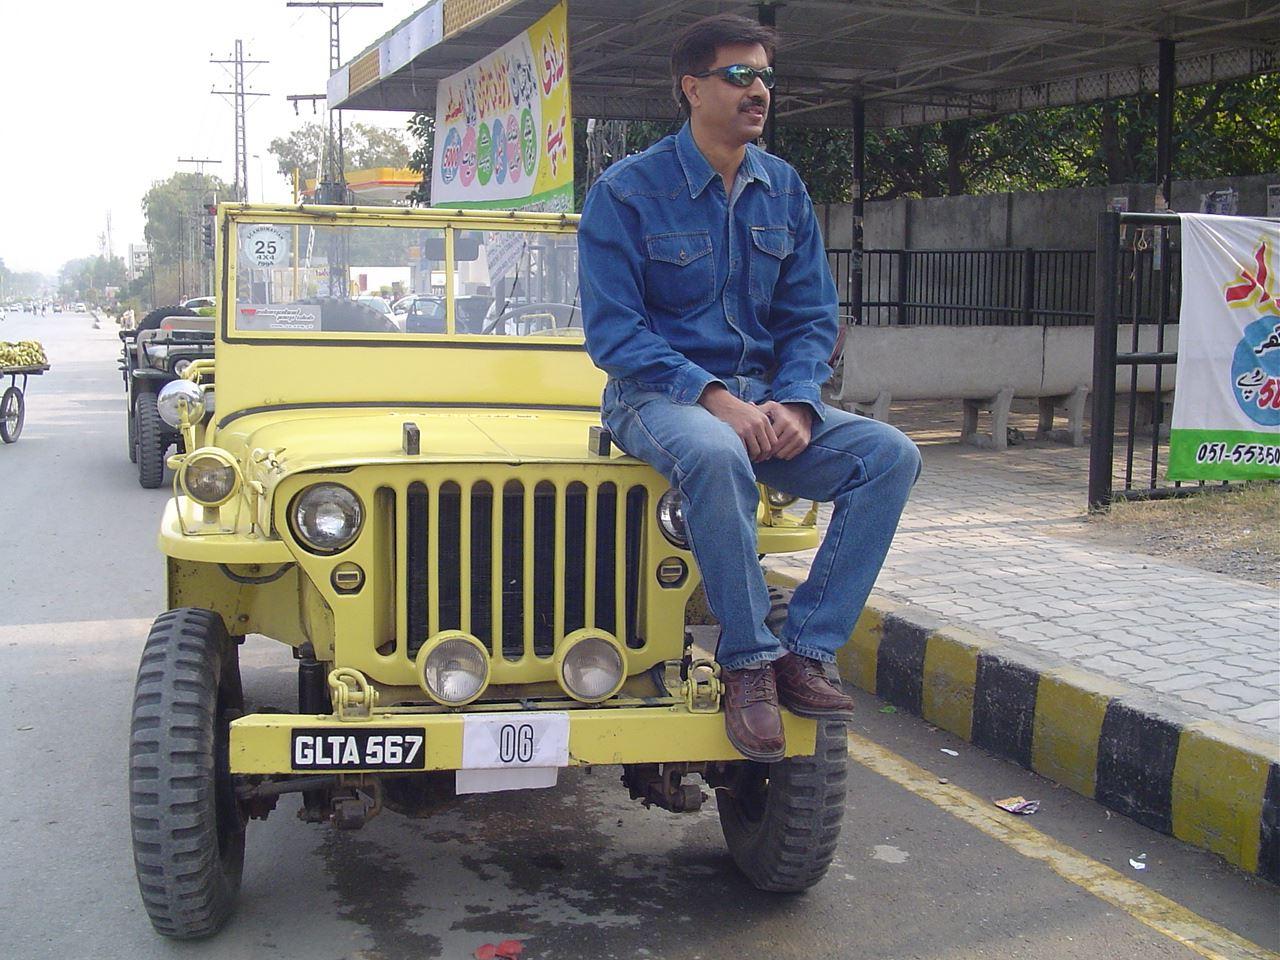 aamir malik ijc (3)